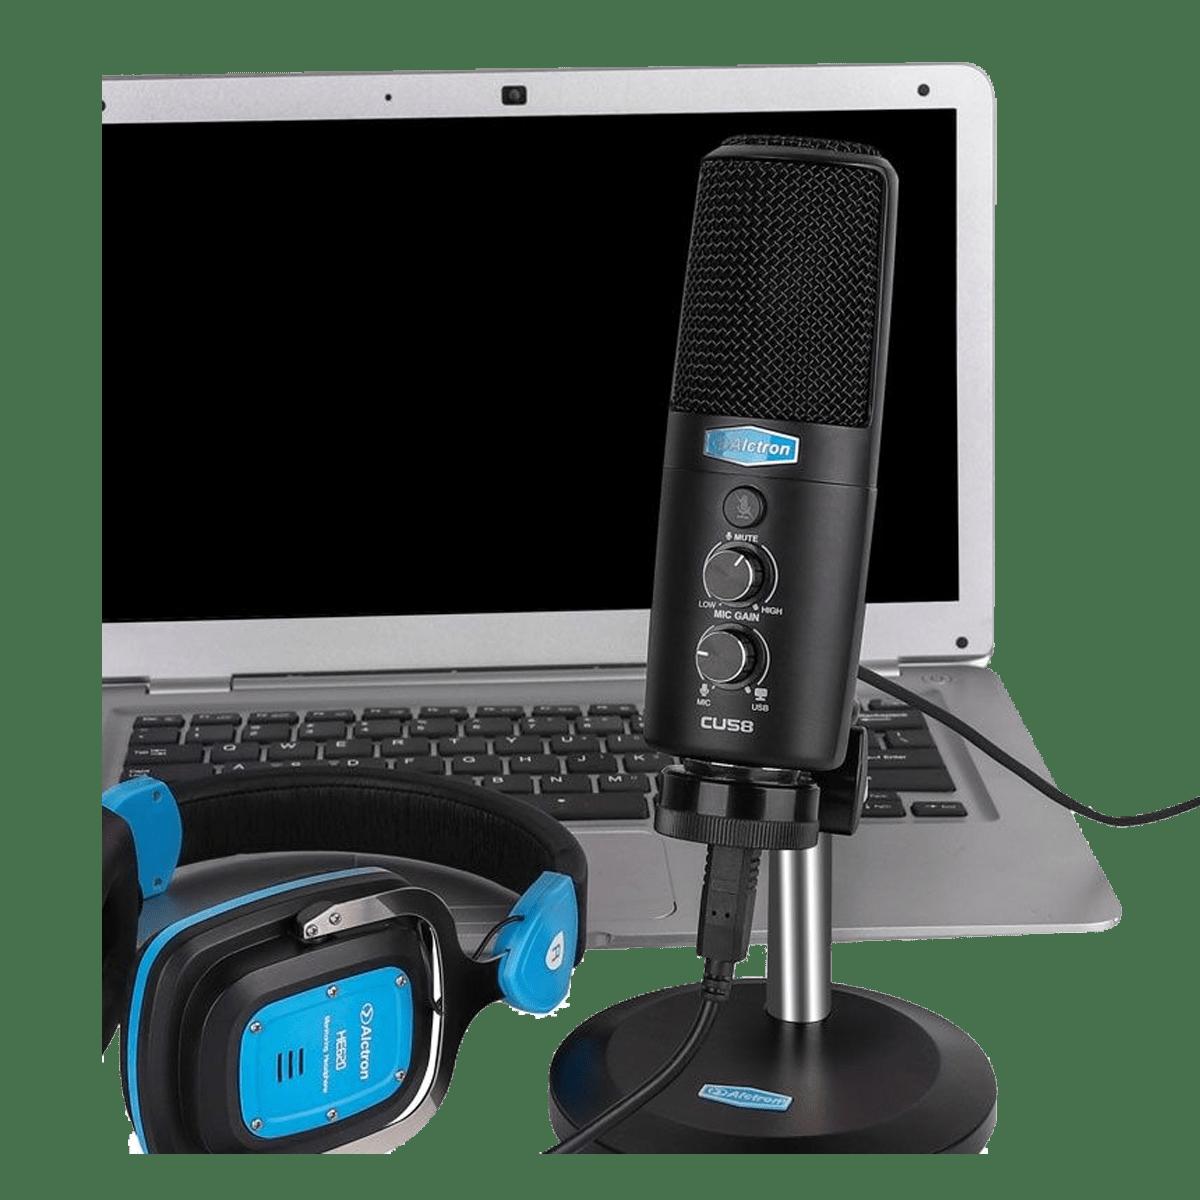 CU58 ScaleNordic Distributor of Pro Audio equipment